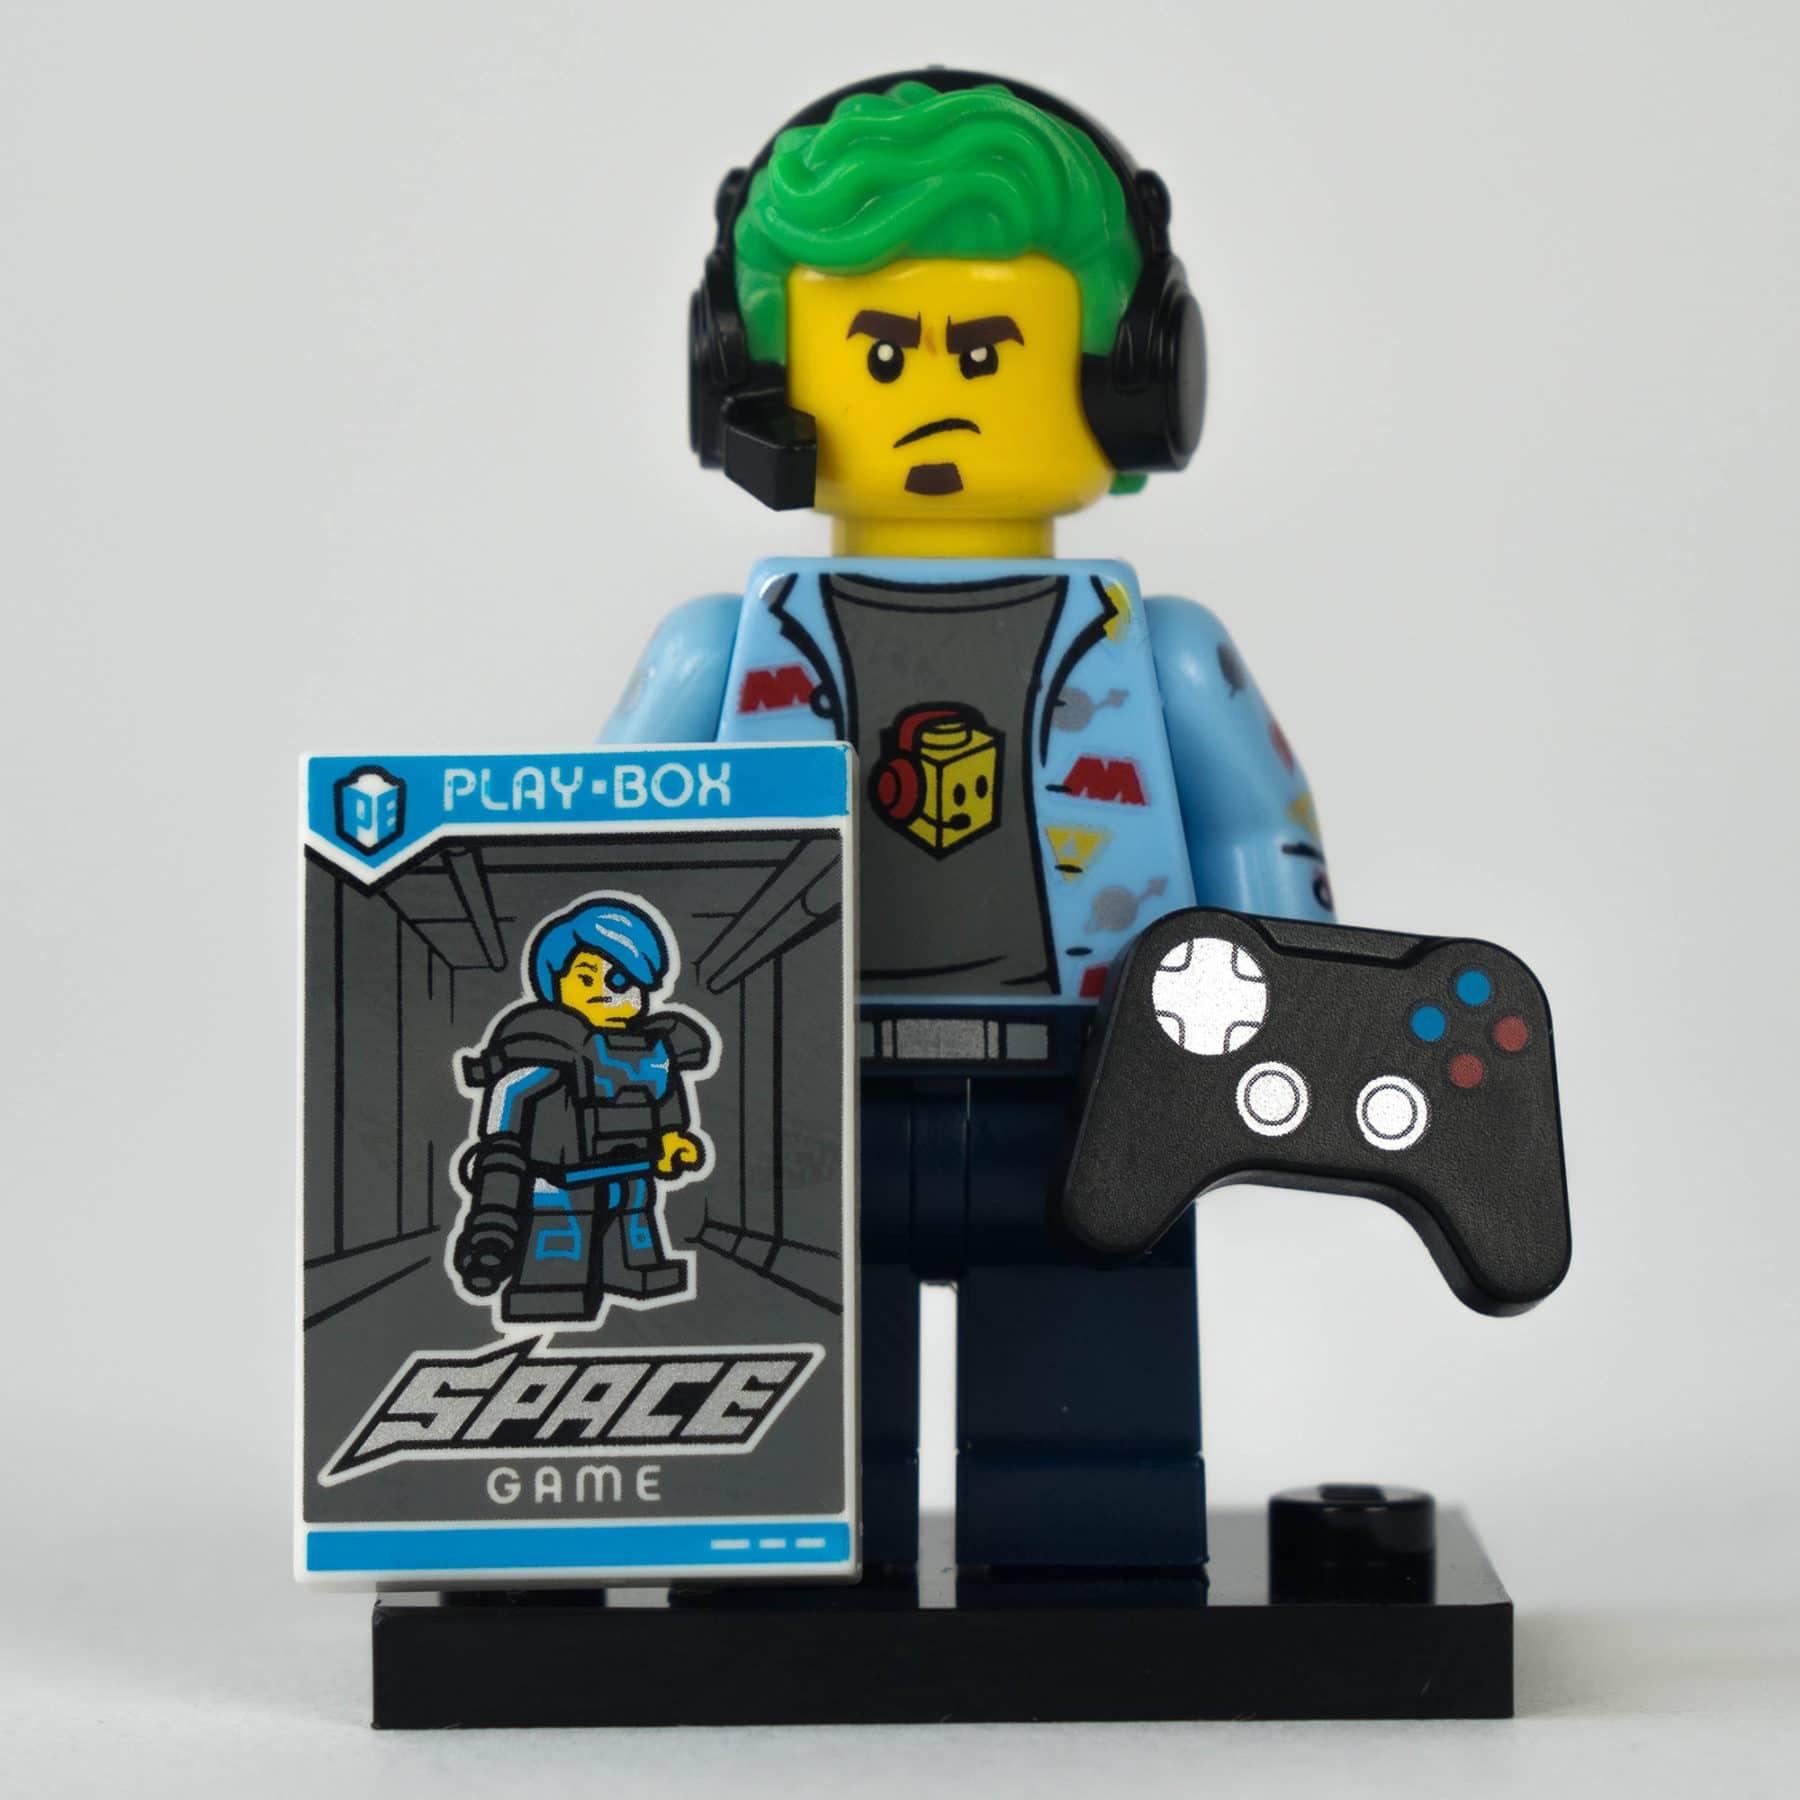 LEGO 71025 Minifigur: Gamer